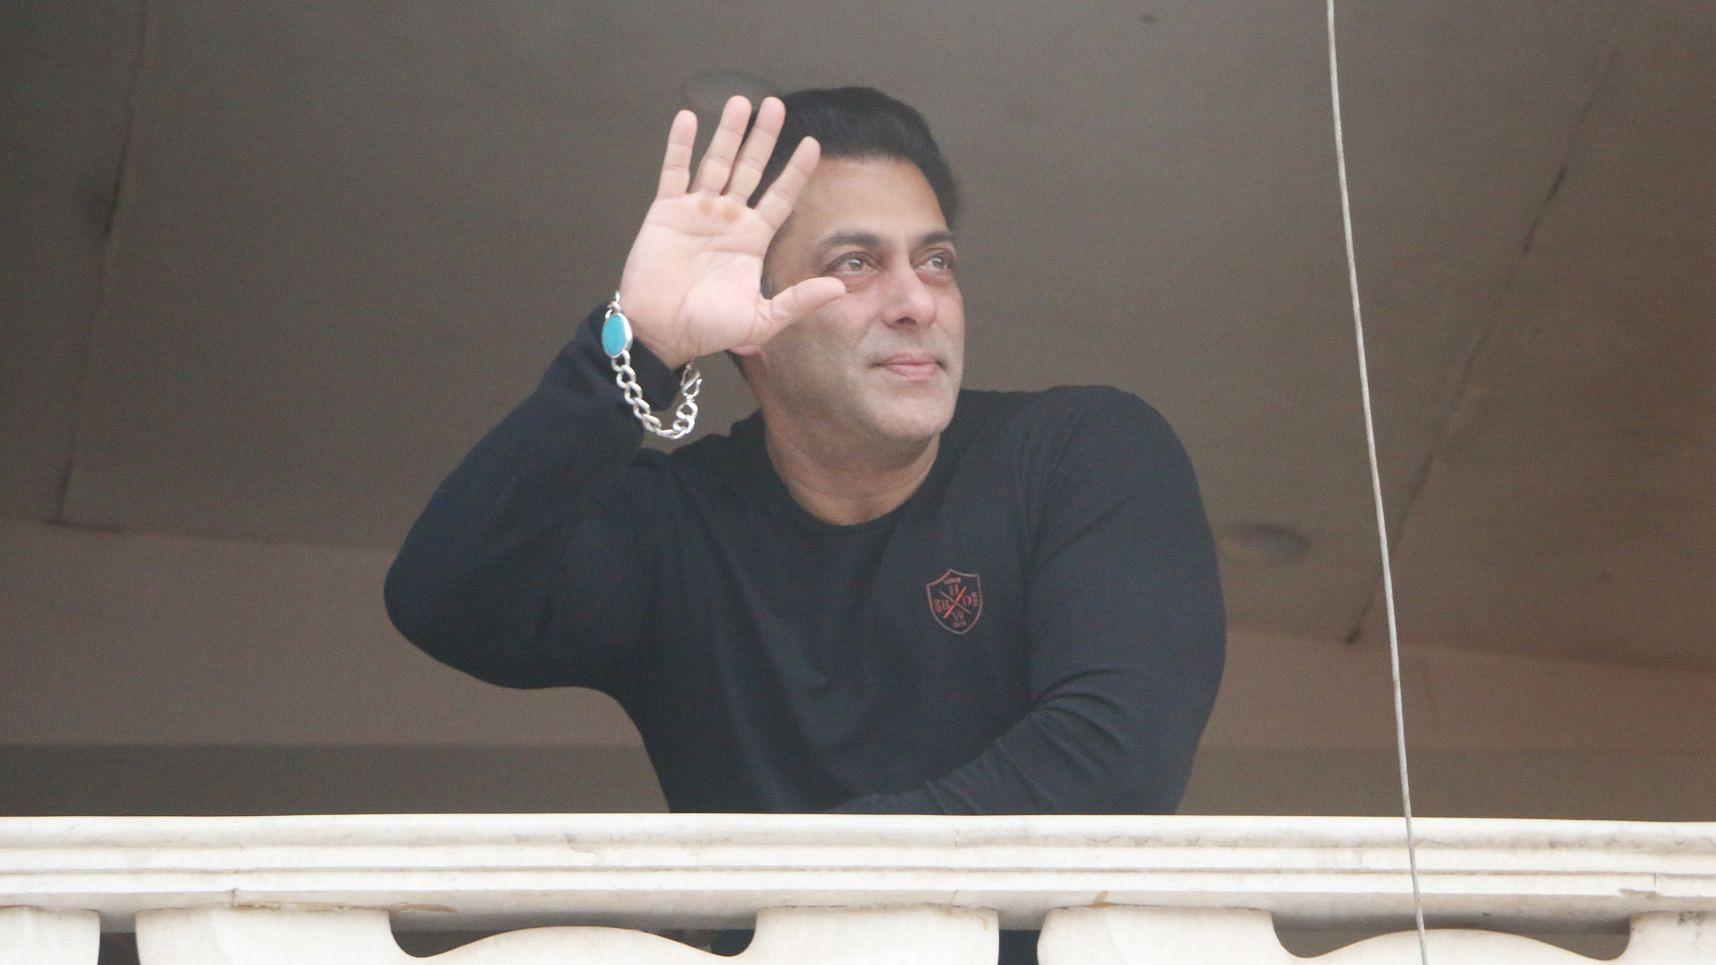 Salman Khan-Starrer 'Kick 2' Will Hit Theatres on Christmas 2021